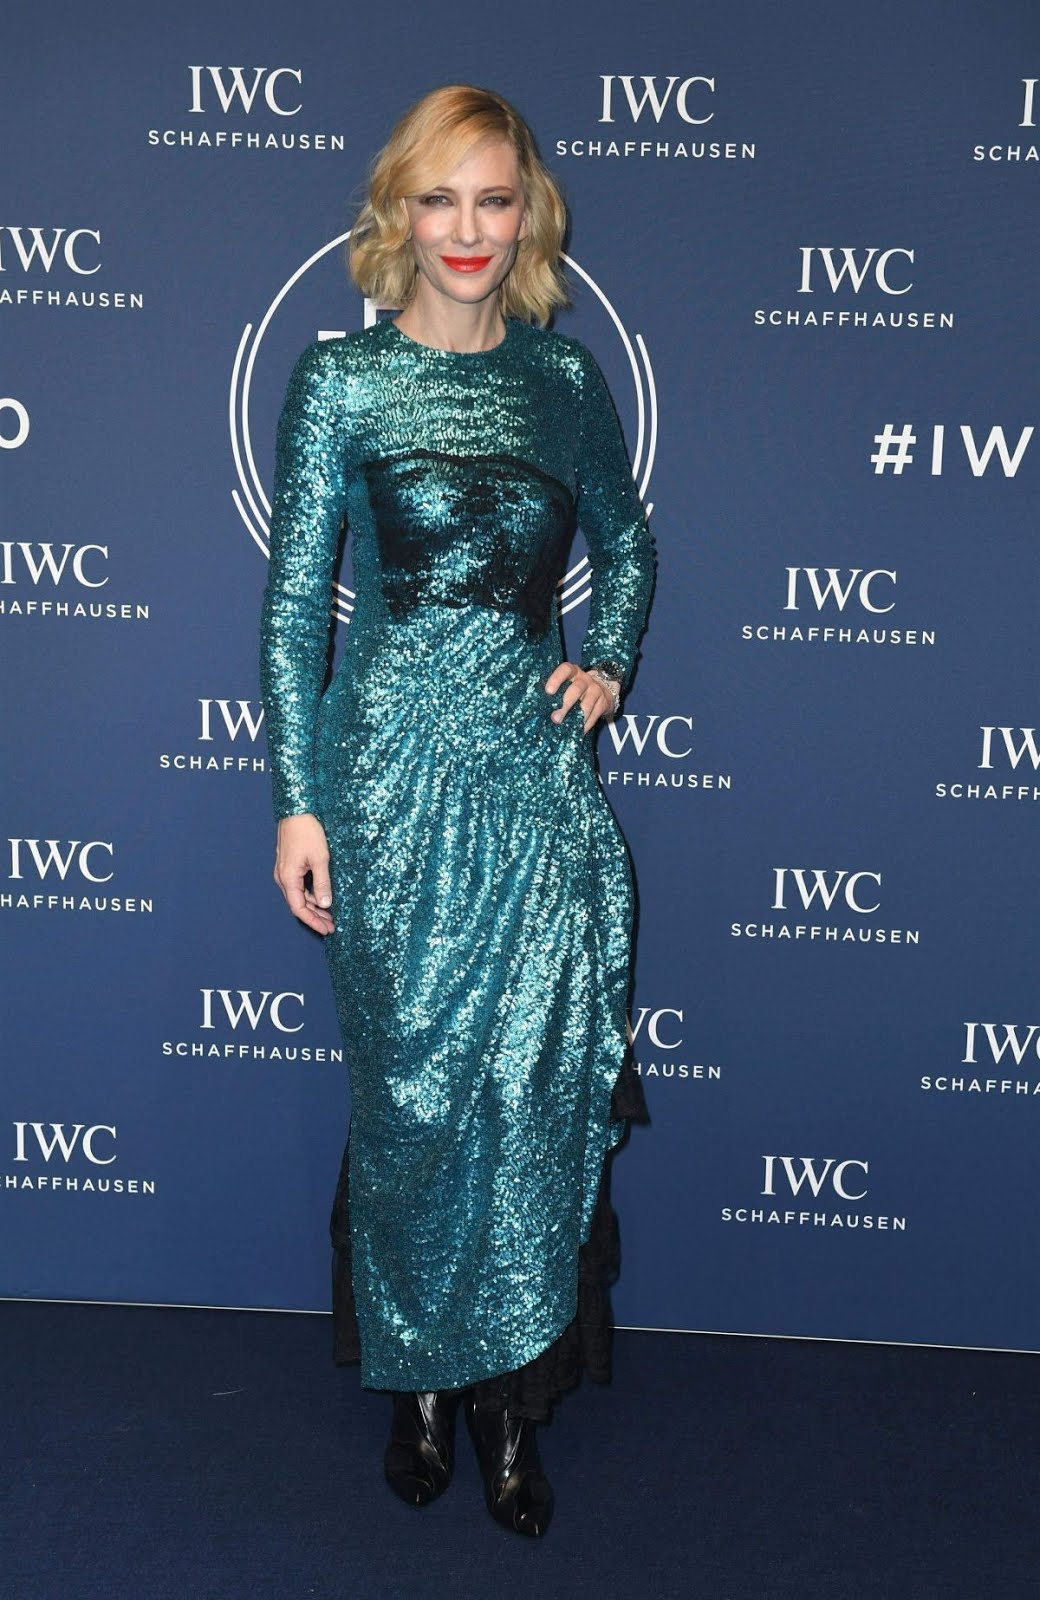 Cate Blanchett At IWC Schaffhausen Gala At Sihh 2018 in Geneva